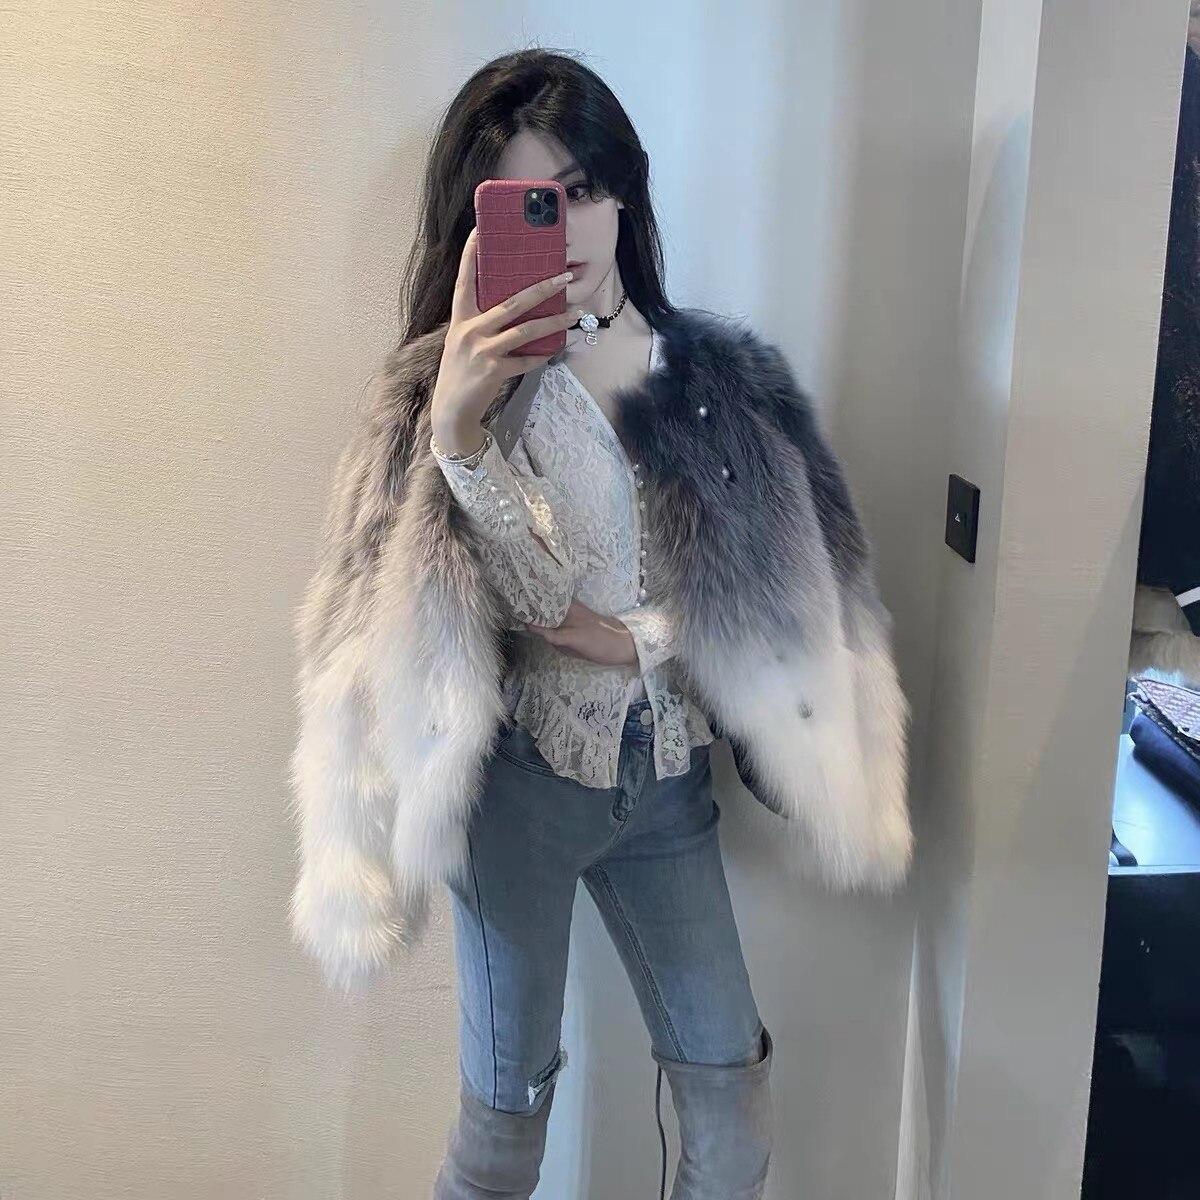 Gradual change fox fur grass coat women 2020 new autumn winter inner gallbladder Haining young fur one coat fashion